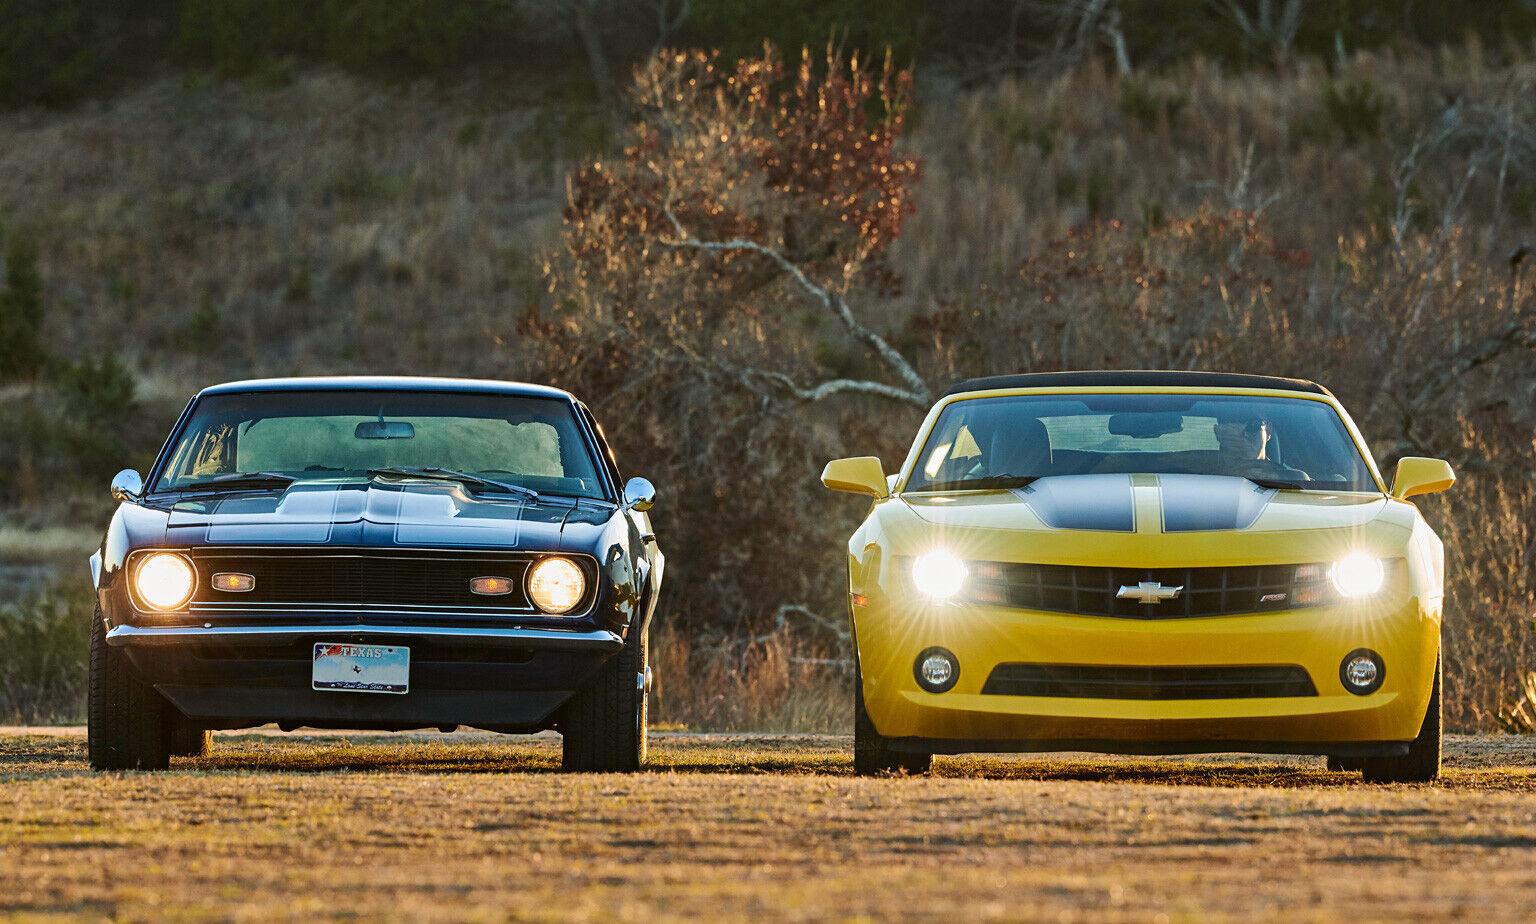 American Muscle Cars | eBay Motors